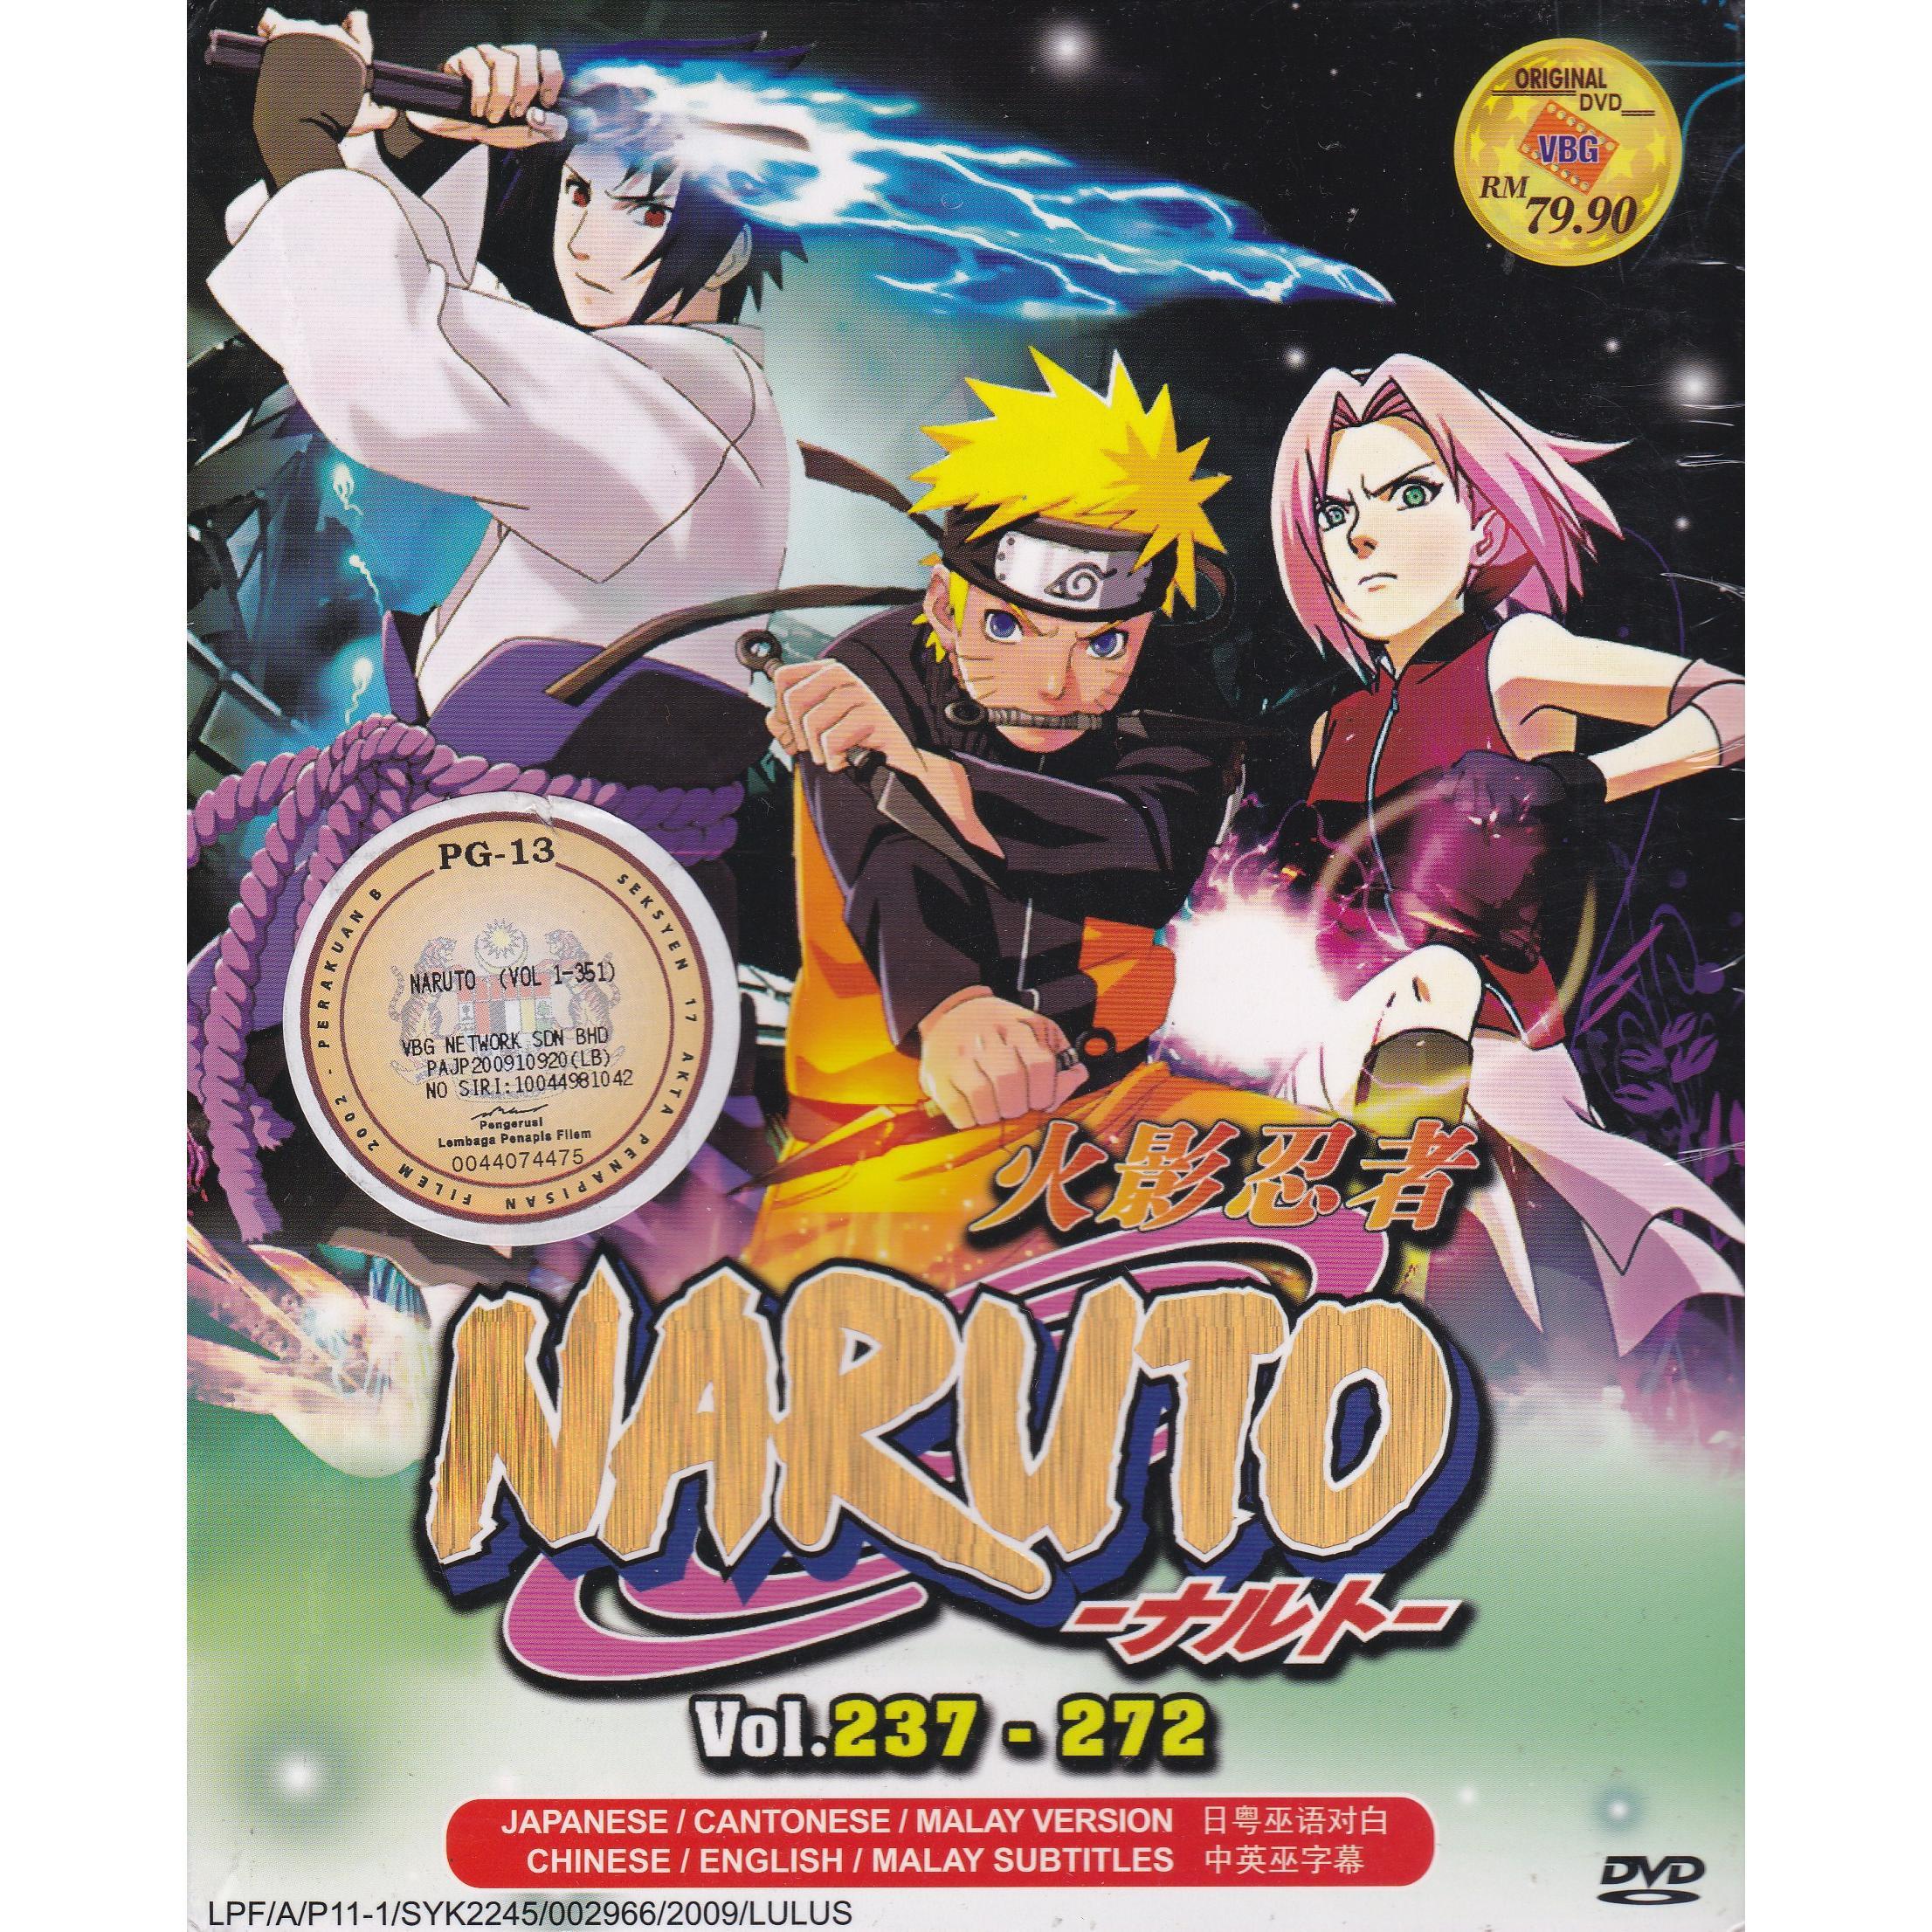 NARUTO SHIPPUDEN Vol 237-272 Box Set Anime DVD